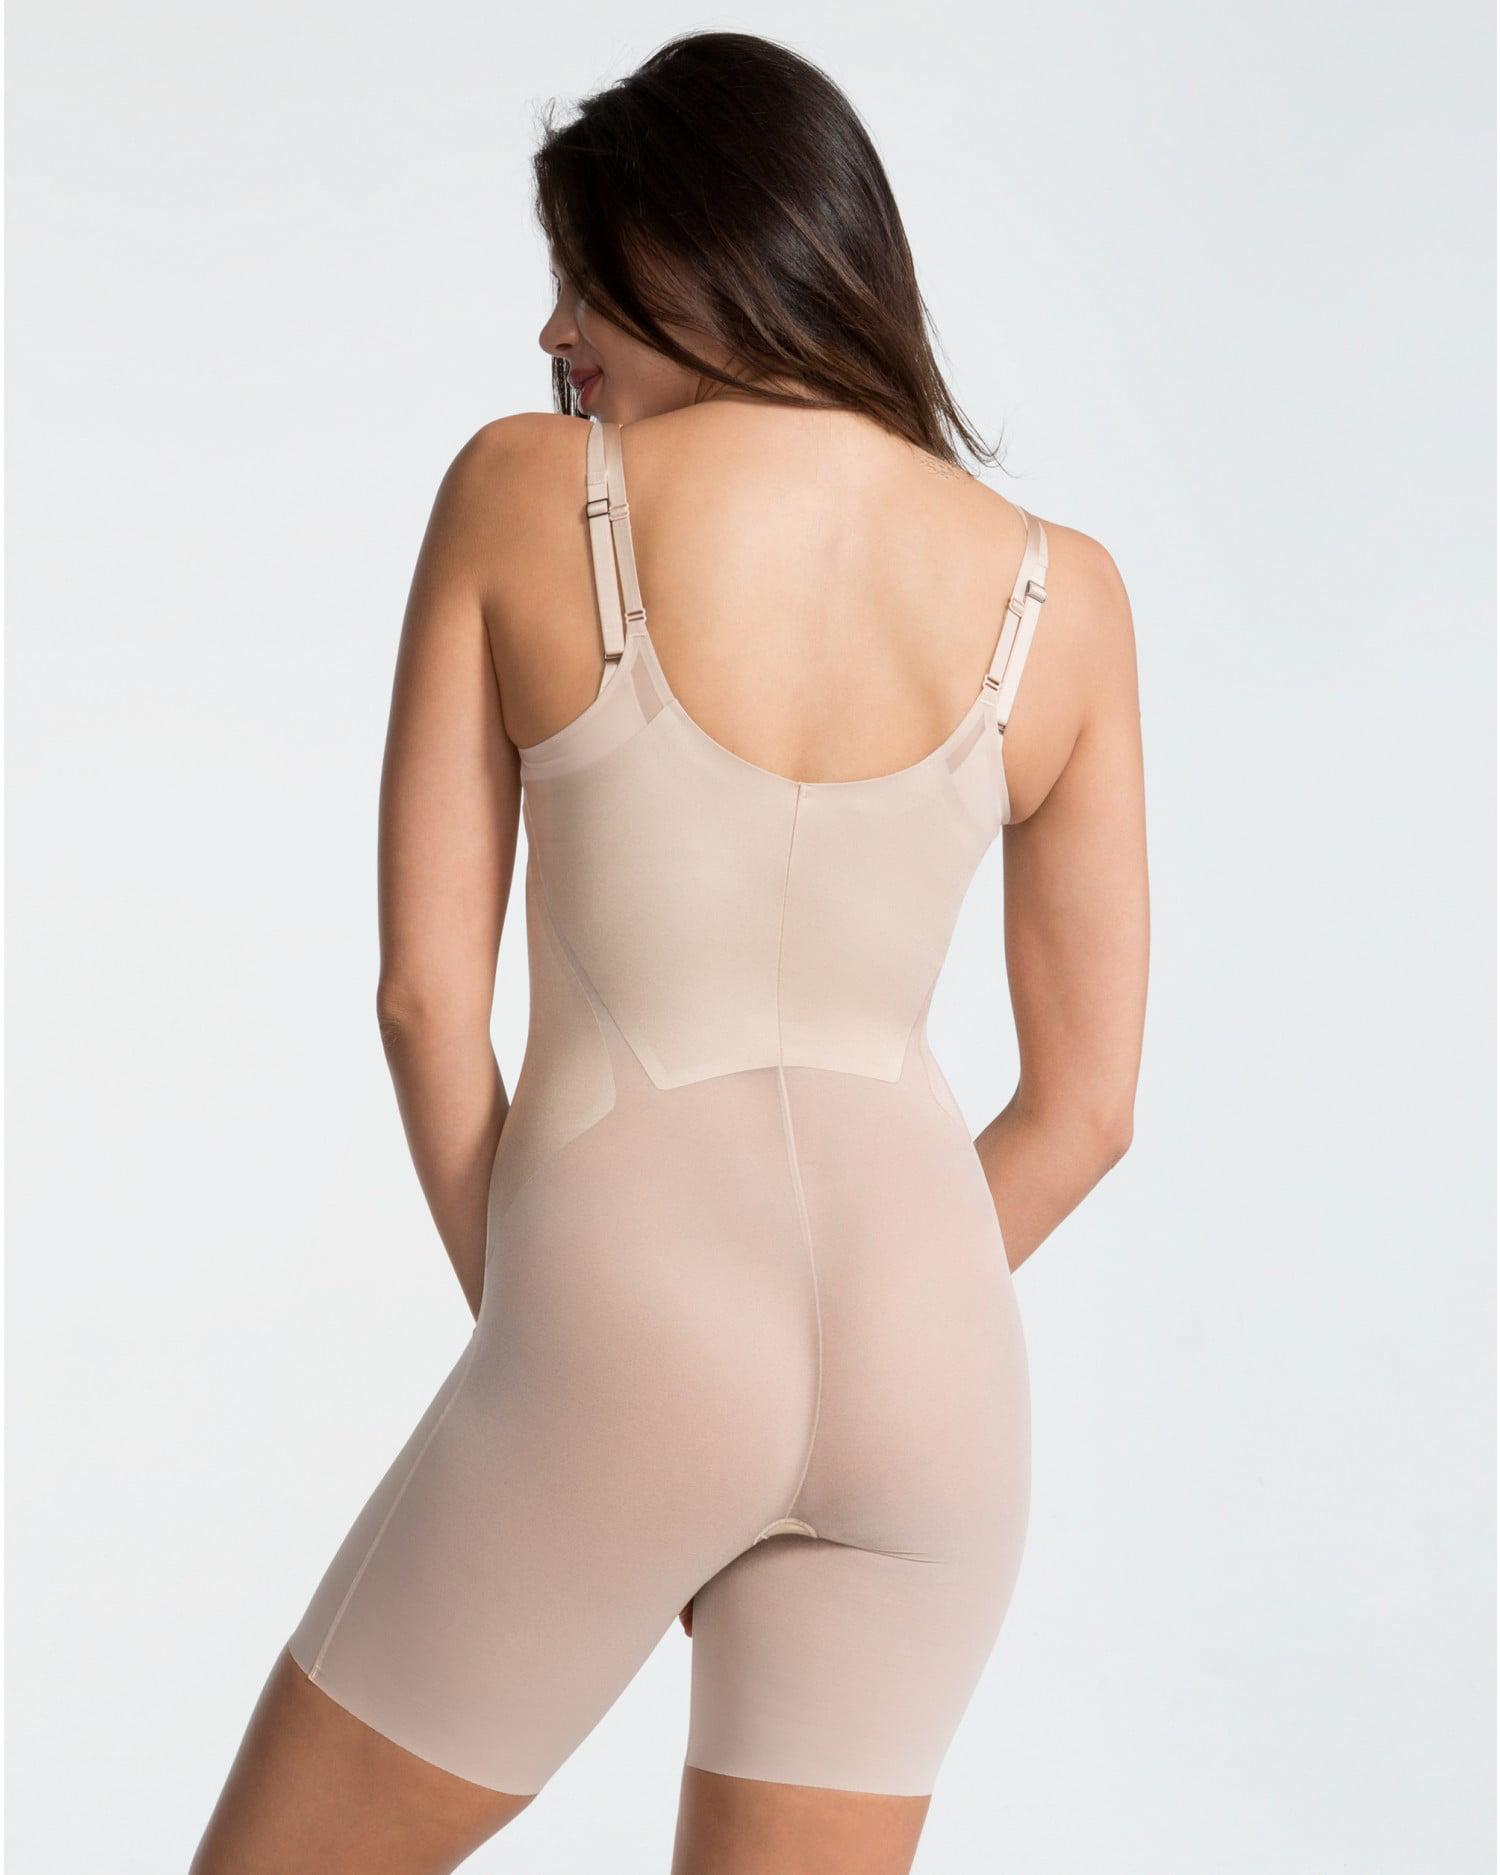 b23aecdc61ca9 Spanx - Spanx FS6815 Haute Contour Open-Bust Mid-Thigh Bodysuit Nude  X-Large - Walmart.com